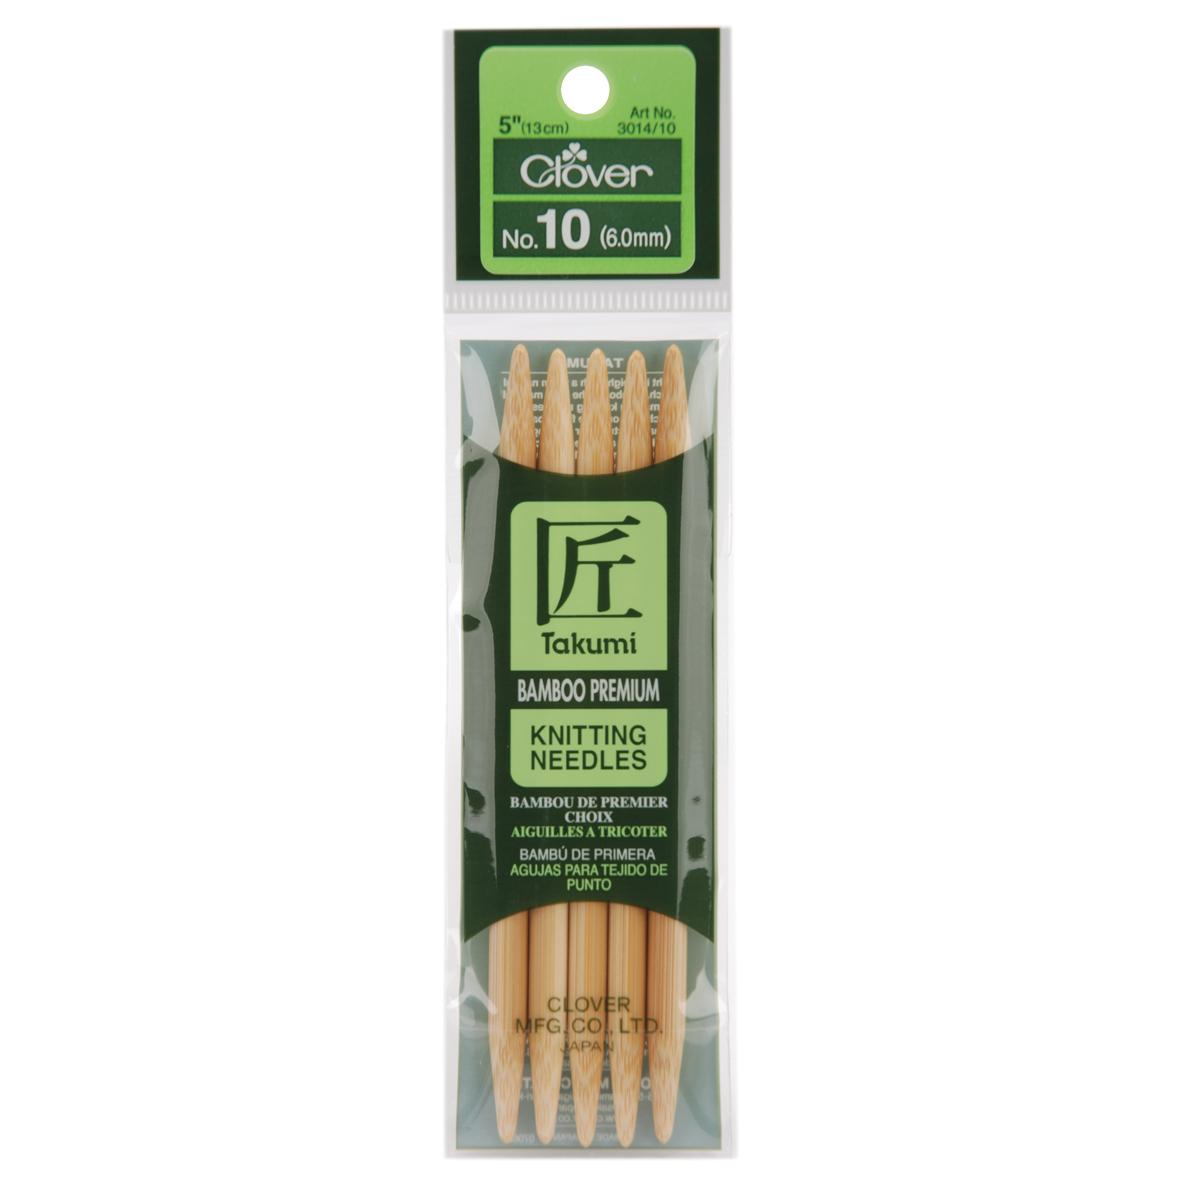 Takumi Bamboo Double Point Knitting Needles 5 5/Pkg-Size 10/6mm